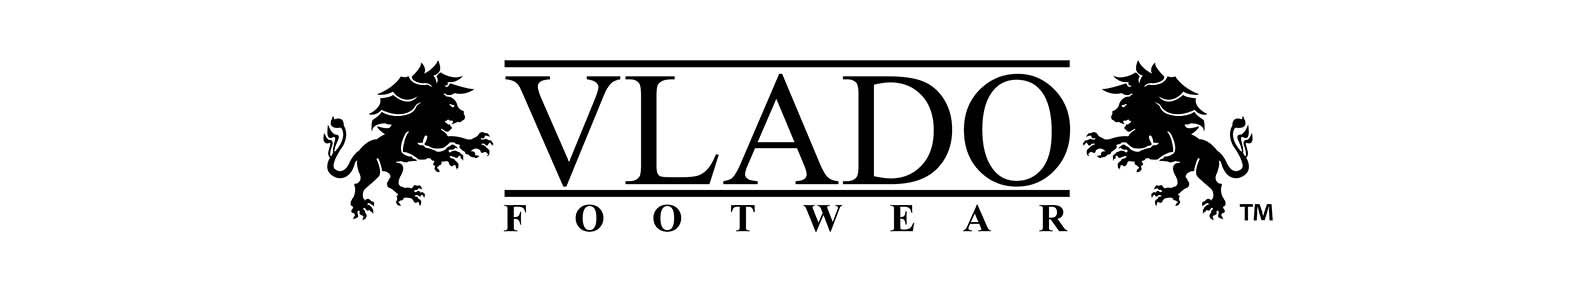 Vlado brand header image